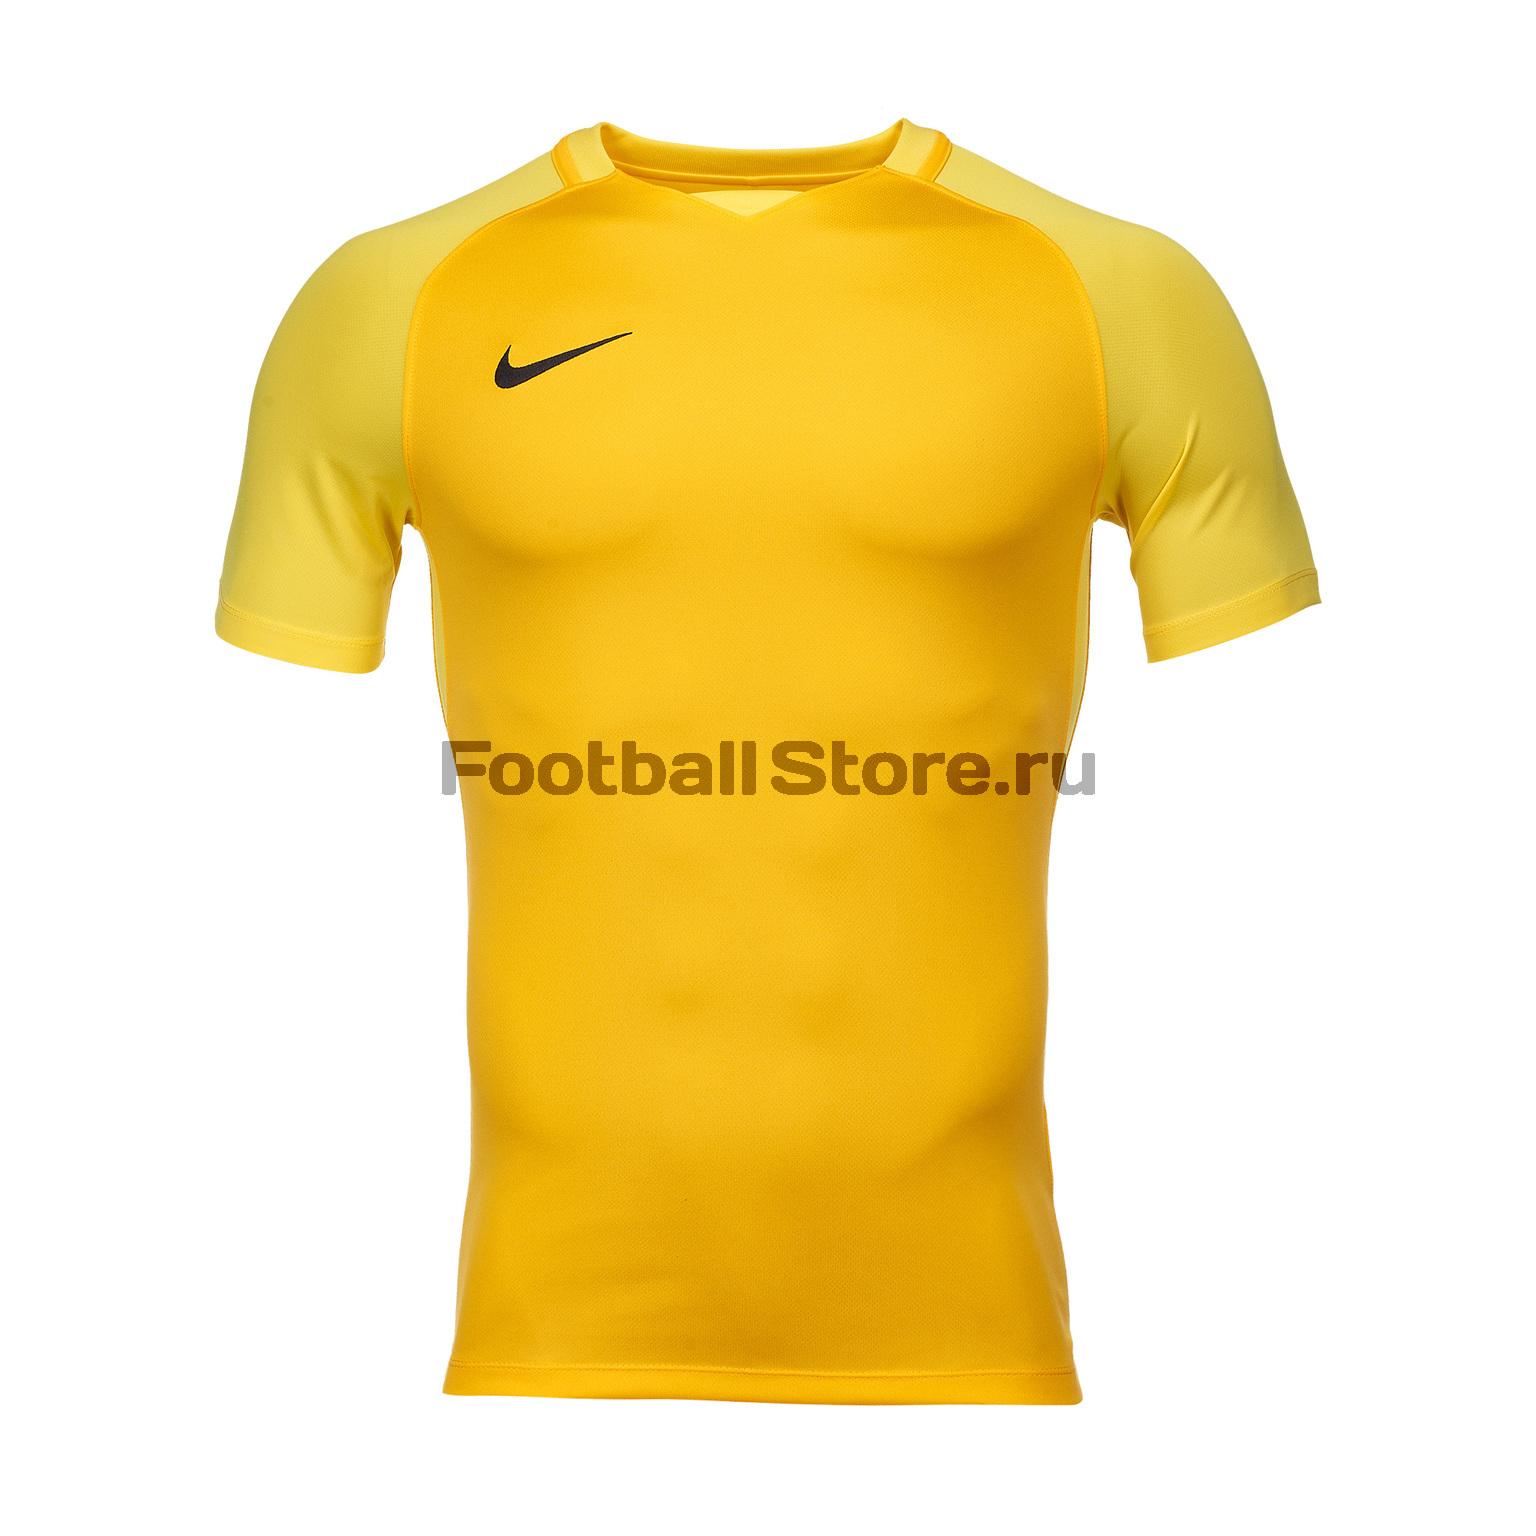 Футболки Nike Футболка игровая Nike Trophy III 881483-739 игровая форма nike футболка детская nike ss precision iii jsy boys 645918 410